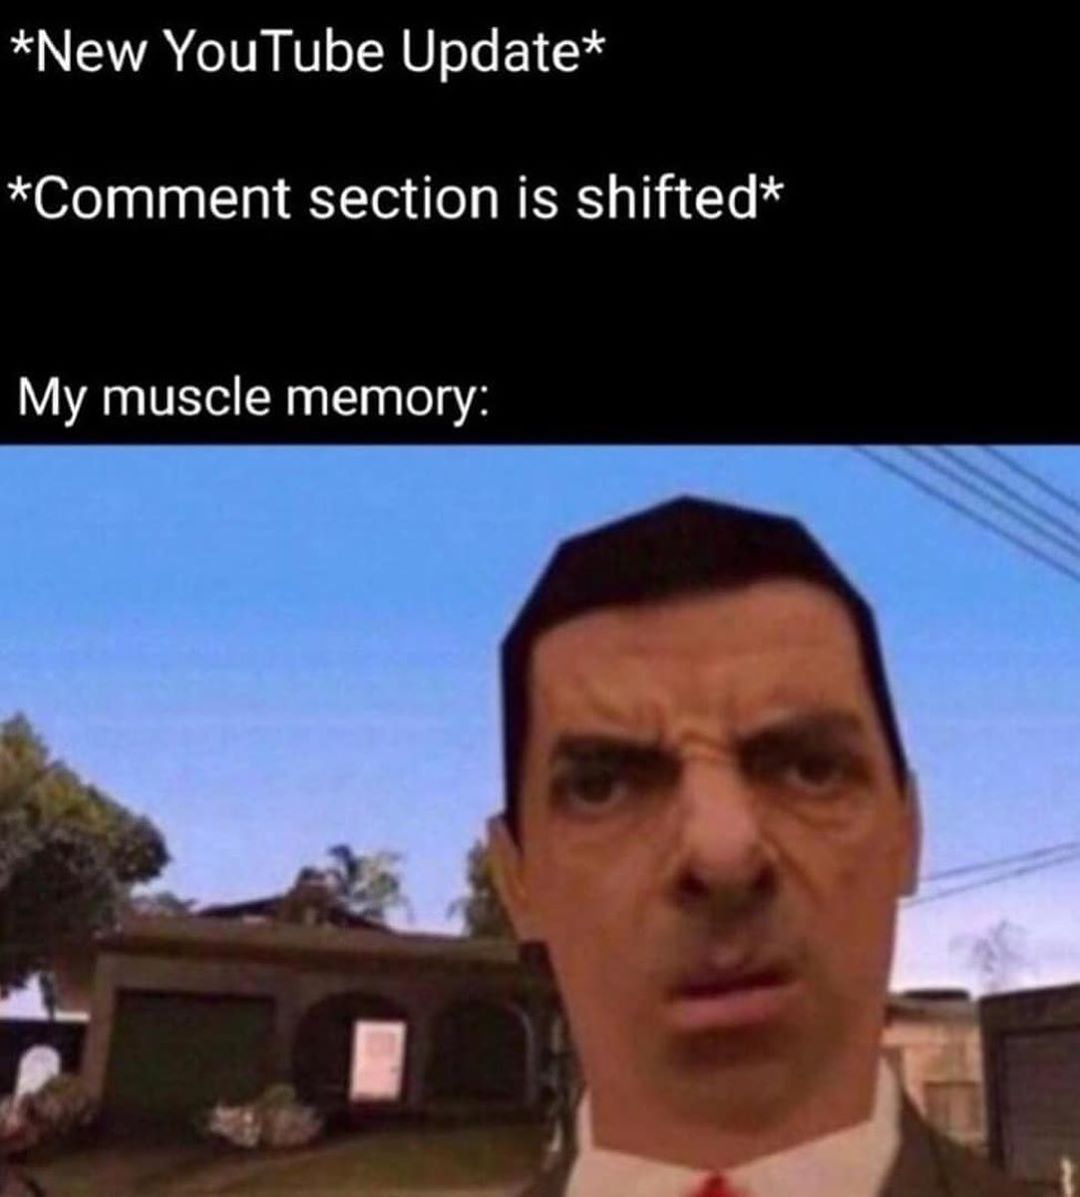 Meme S Quotes Memes Its Memes Laughing Memes Memes Quotes Funnie Memes I Meme Truthful Memes Happ Stupid Funny Memes Stupid Memes Funny Relatable Memes